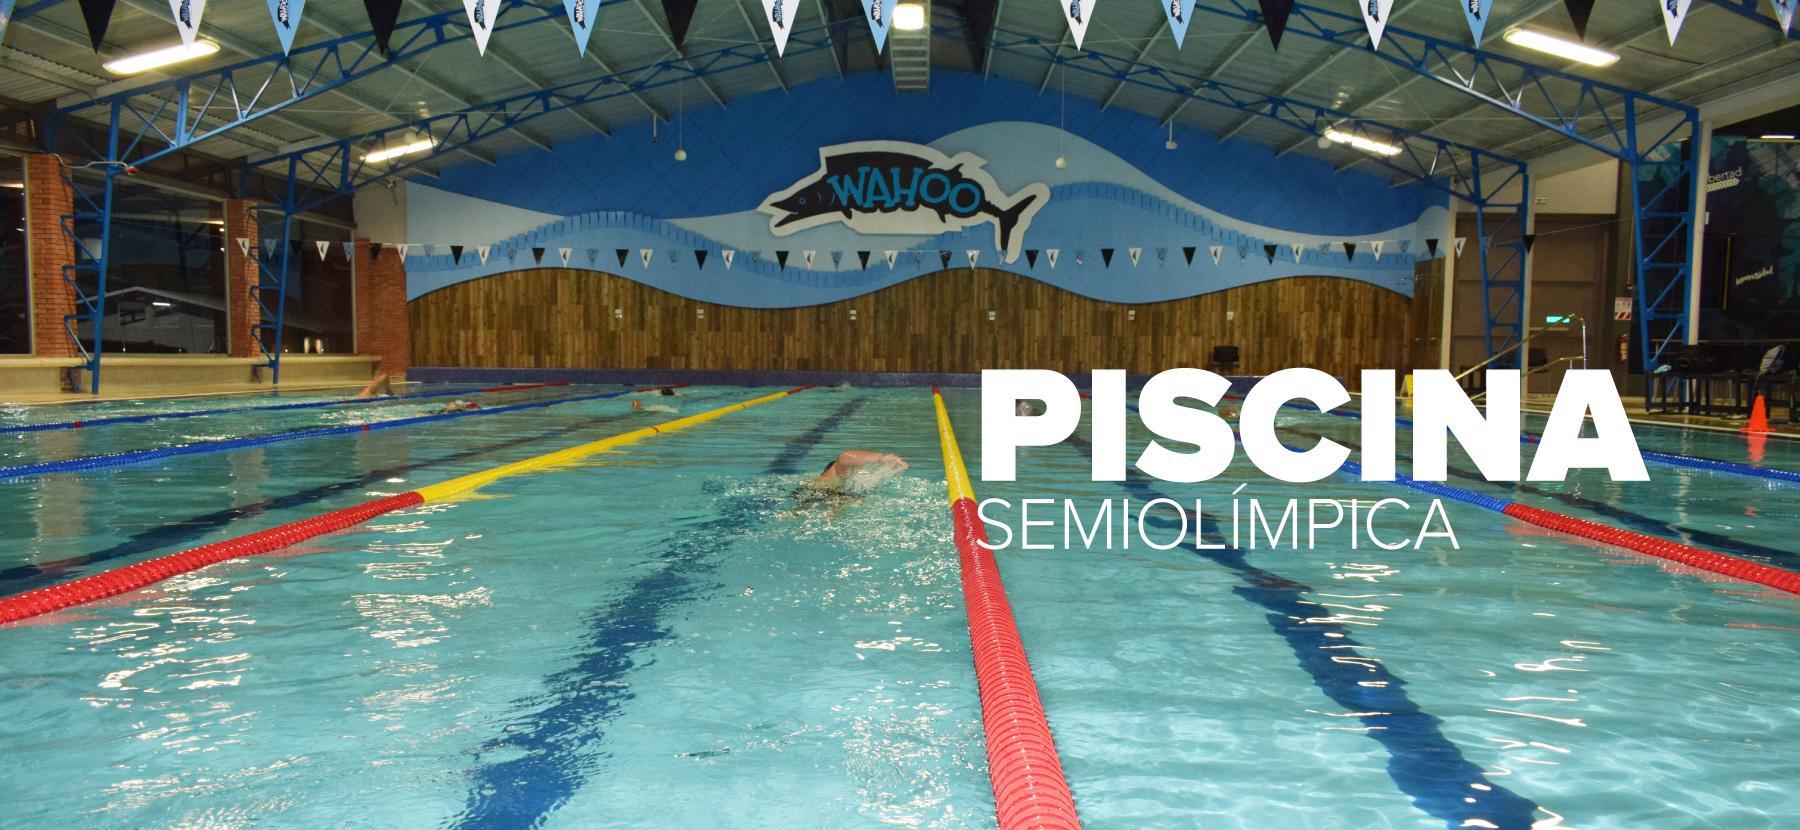 Banner Wahoo - Piscina semiolímpica